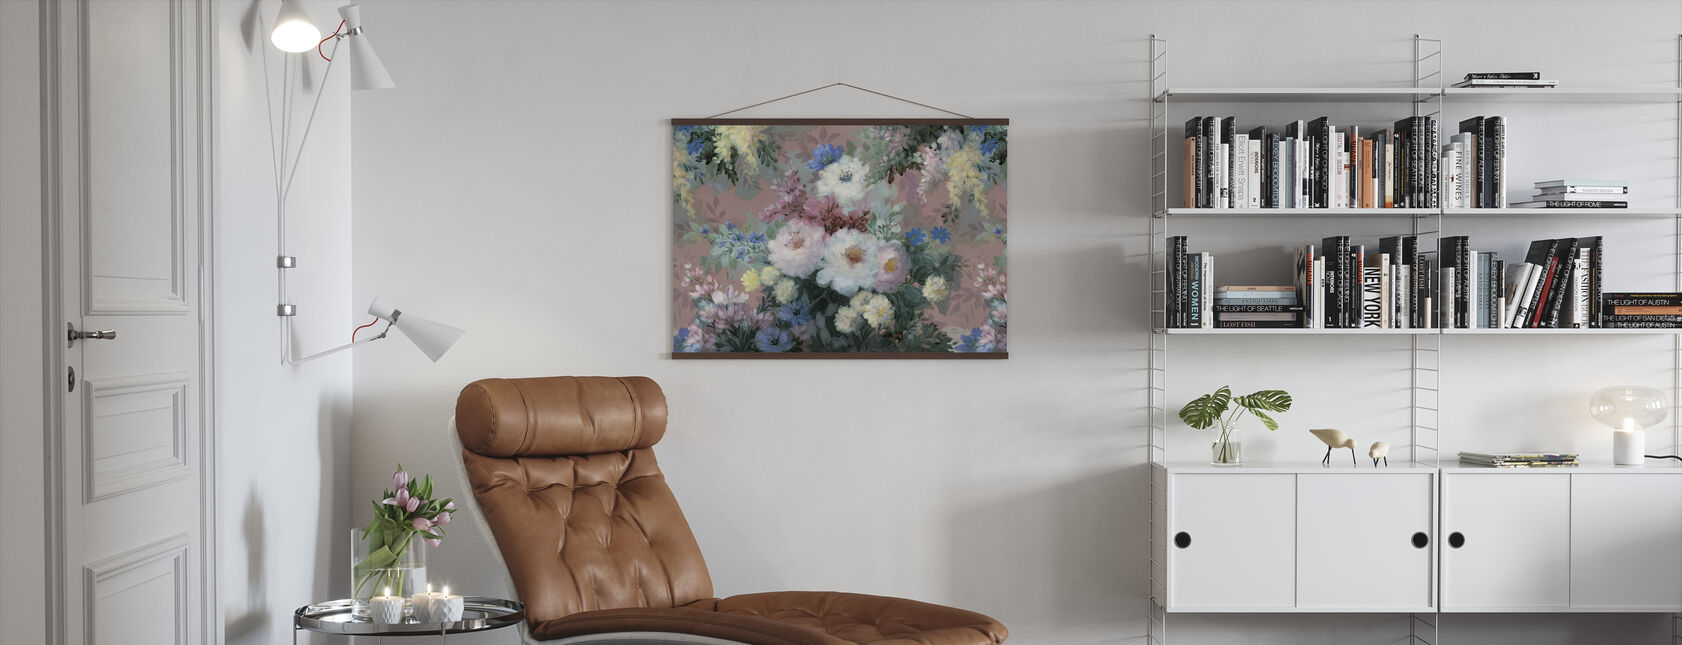 Flourishing Blossom - Poster - Living Room